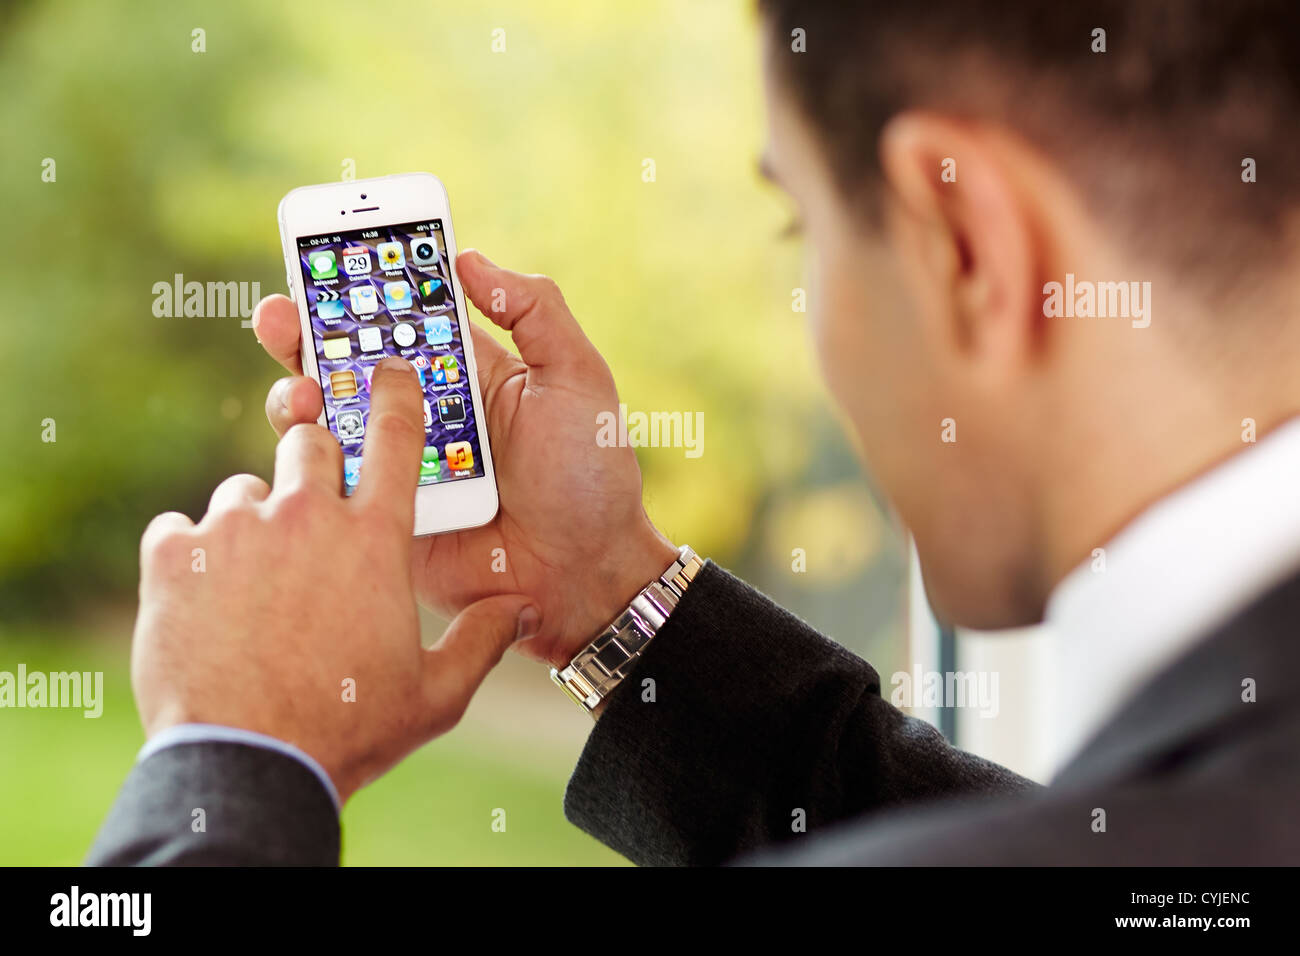 Man using iPhone 5 - Stock Image